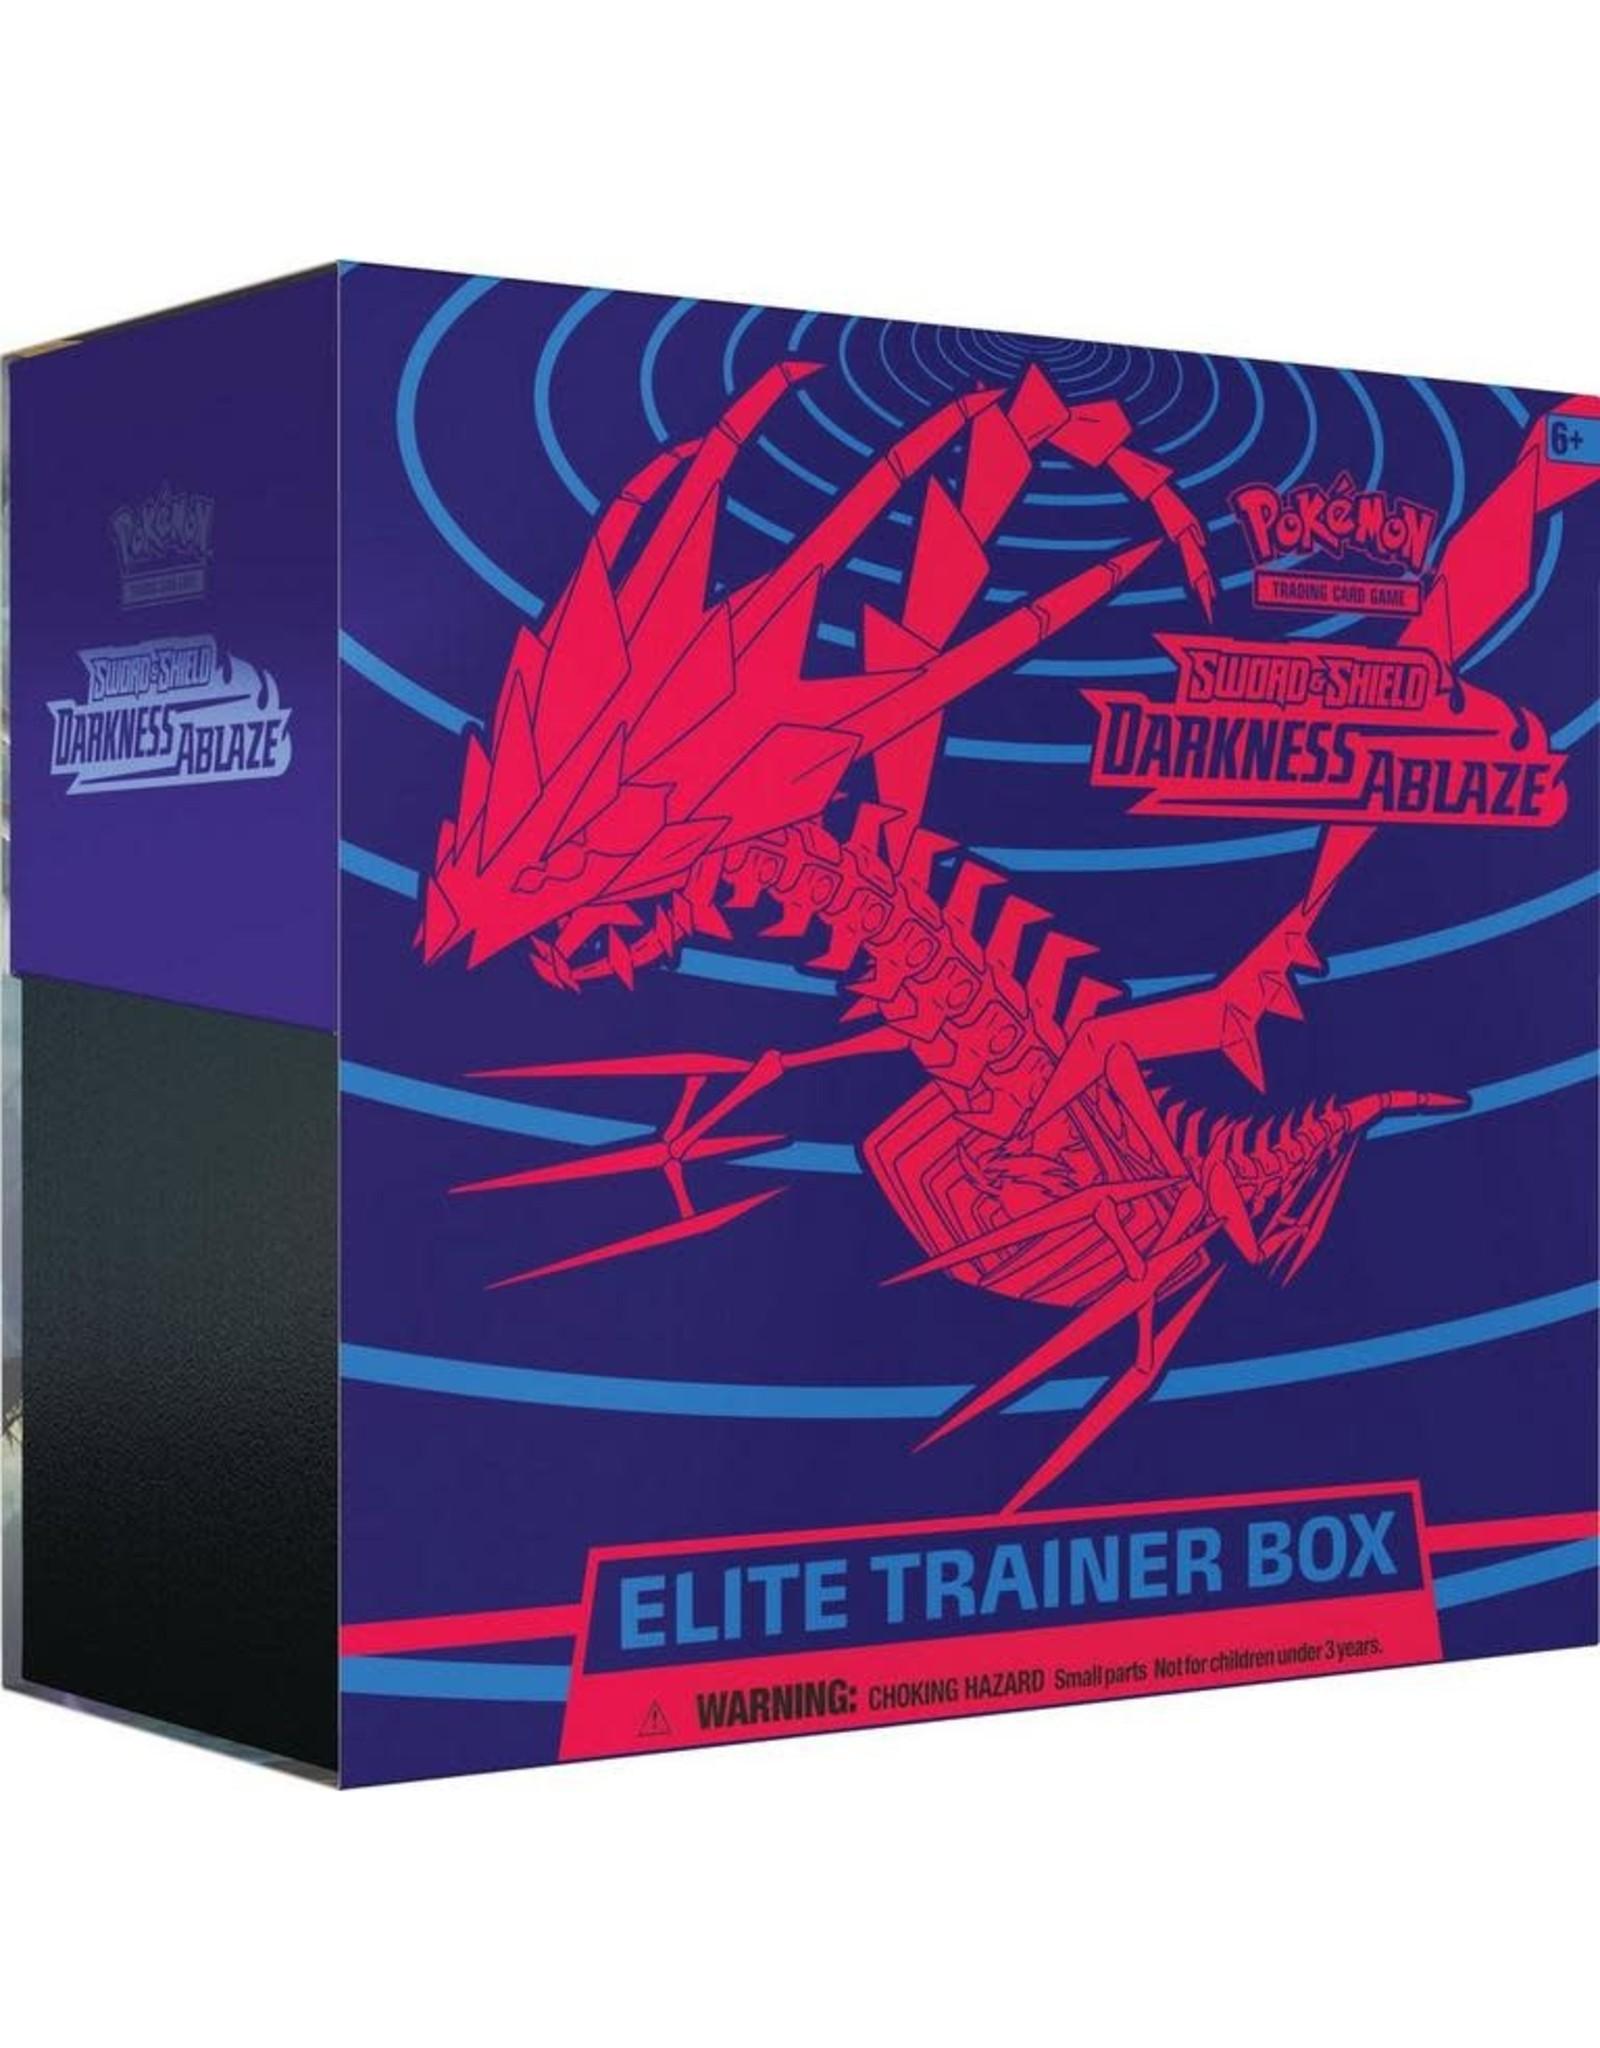 Pokémon PKM Darkness Ablaze Elite Trainer Box